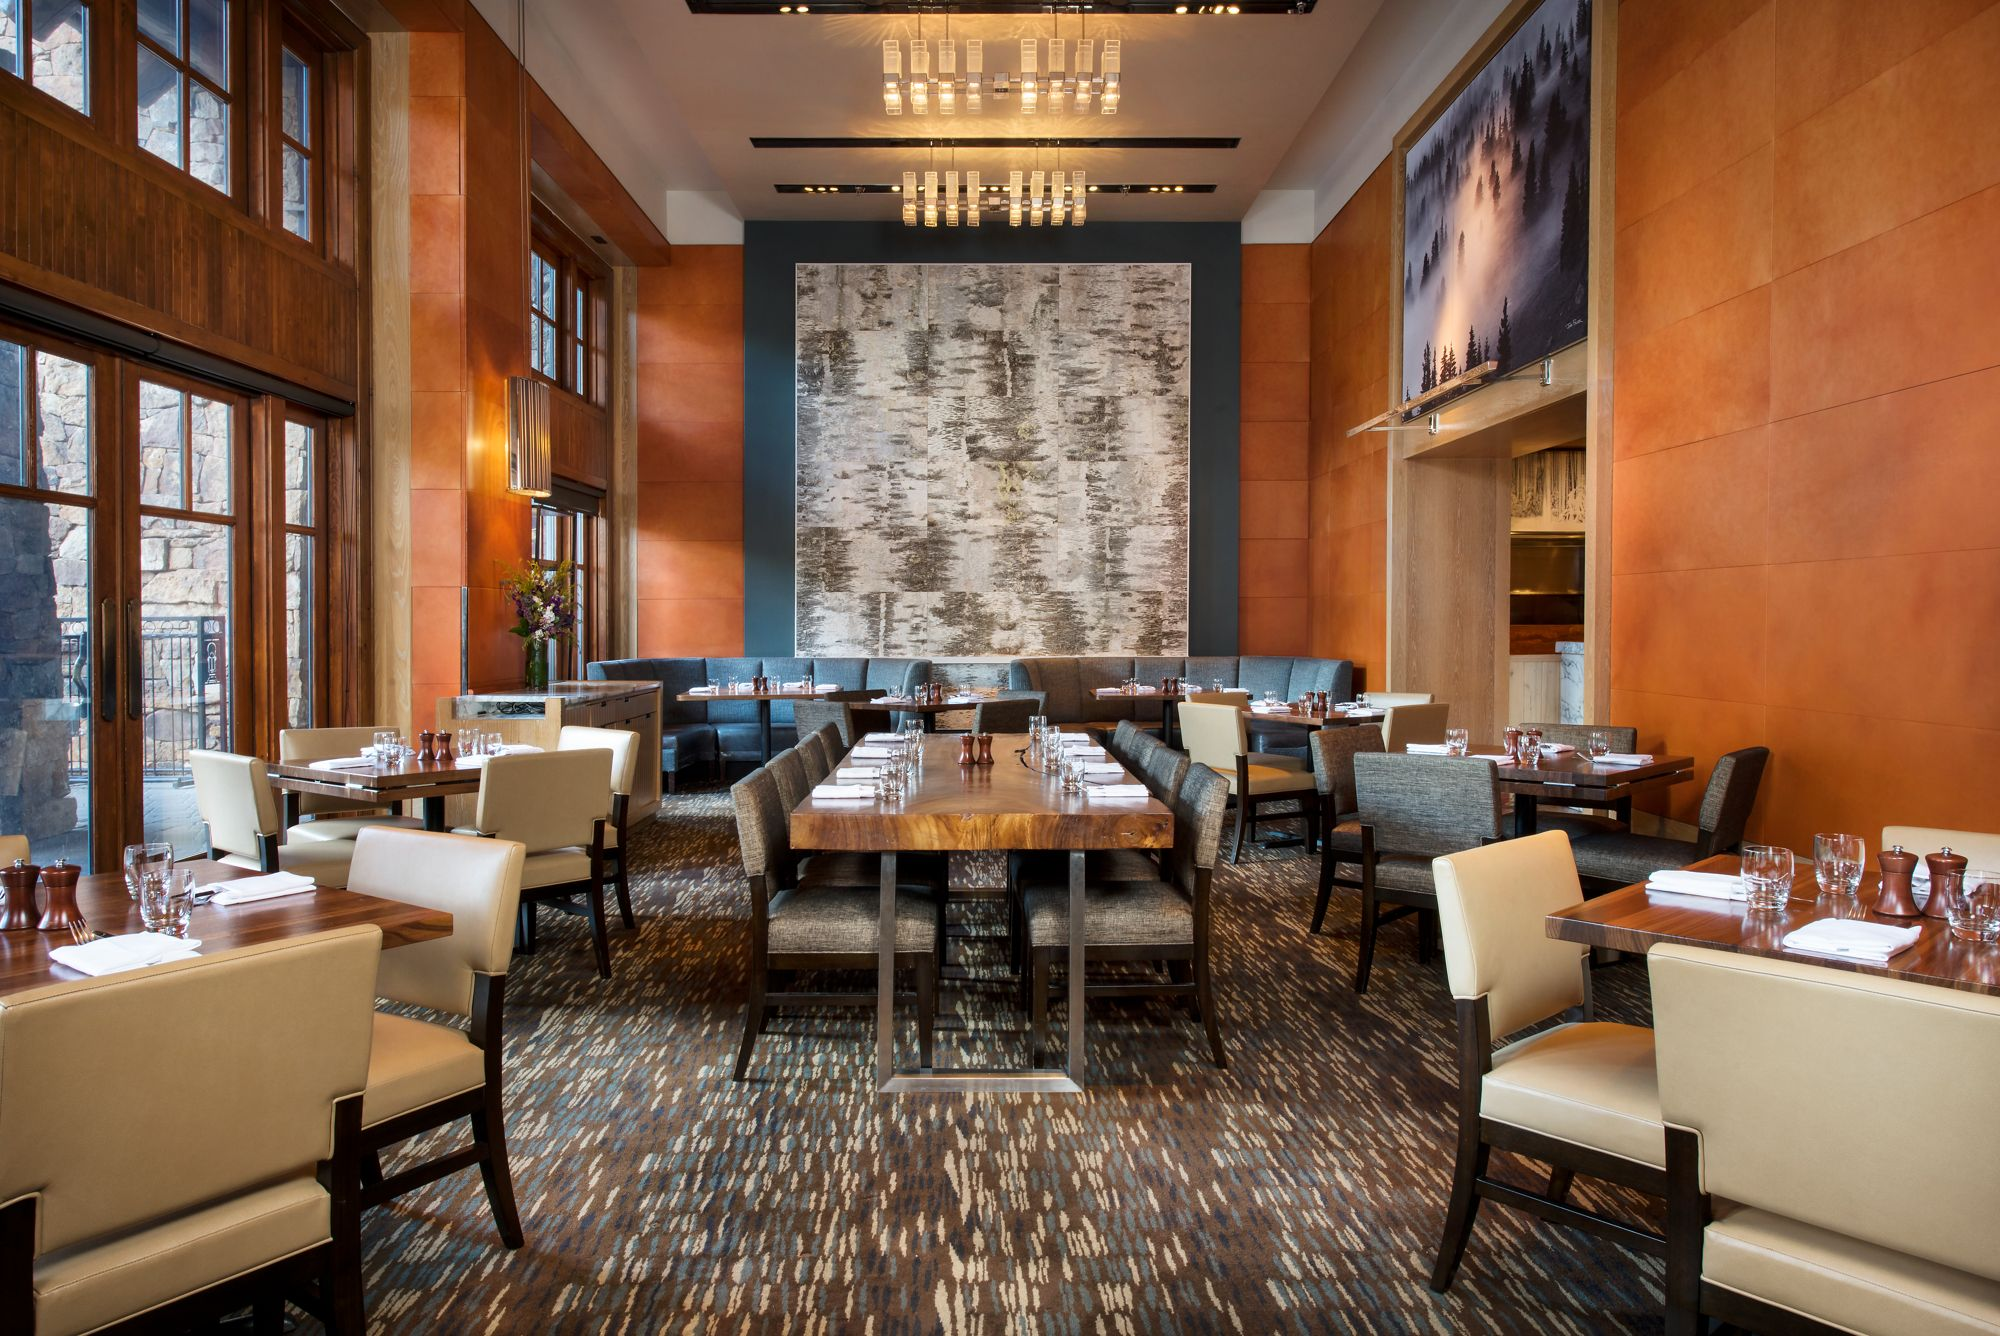 Avon Co American Restaurants The Ritz Carlton Bachelor Gulch